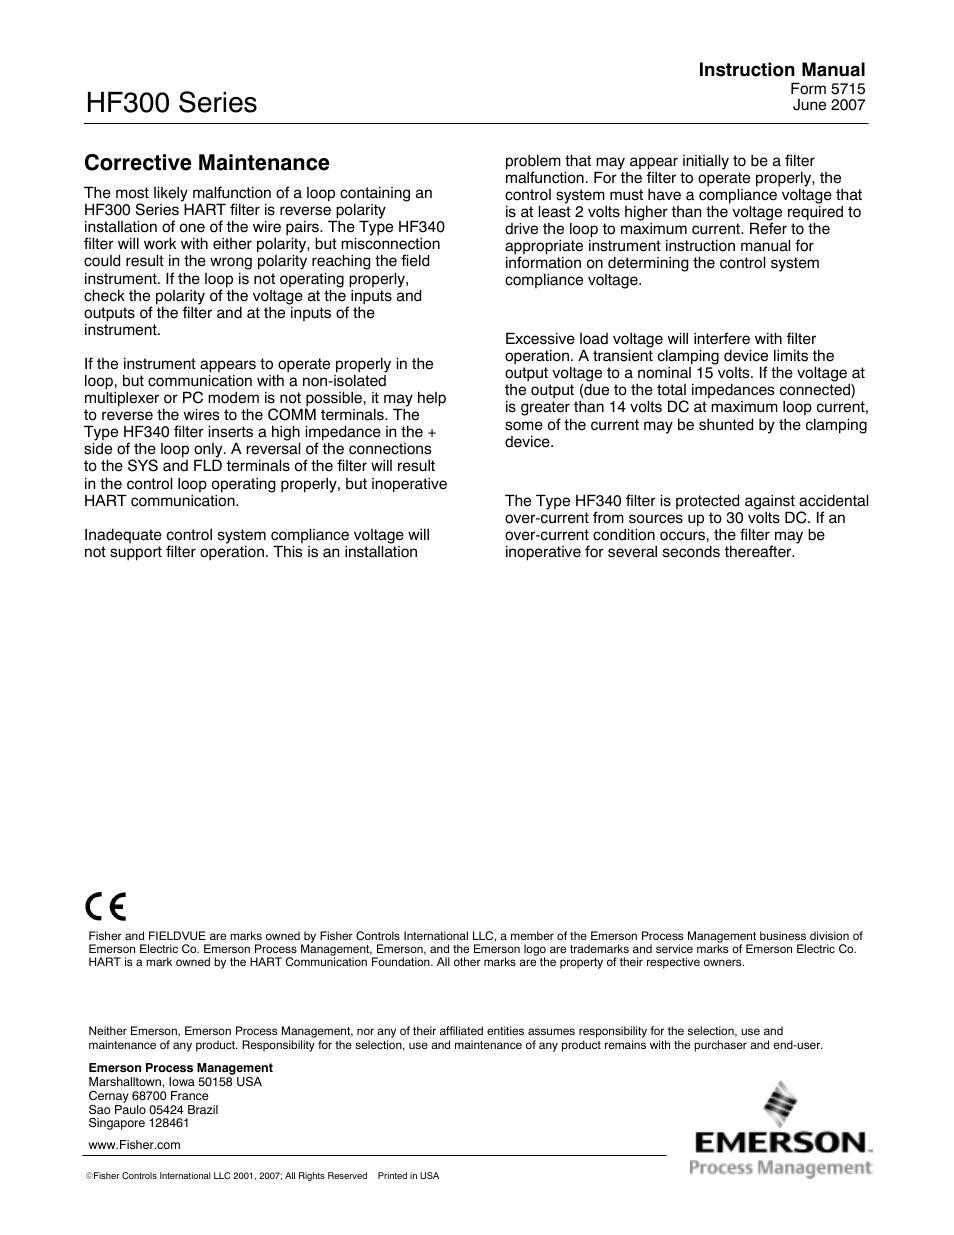 Corrective maintenance, Hf300 series, Instruction manual